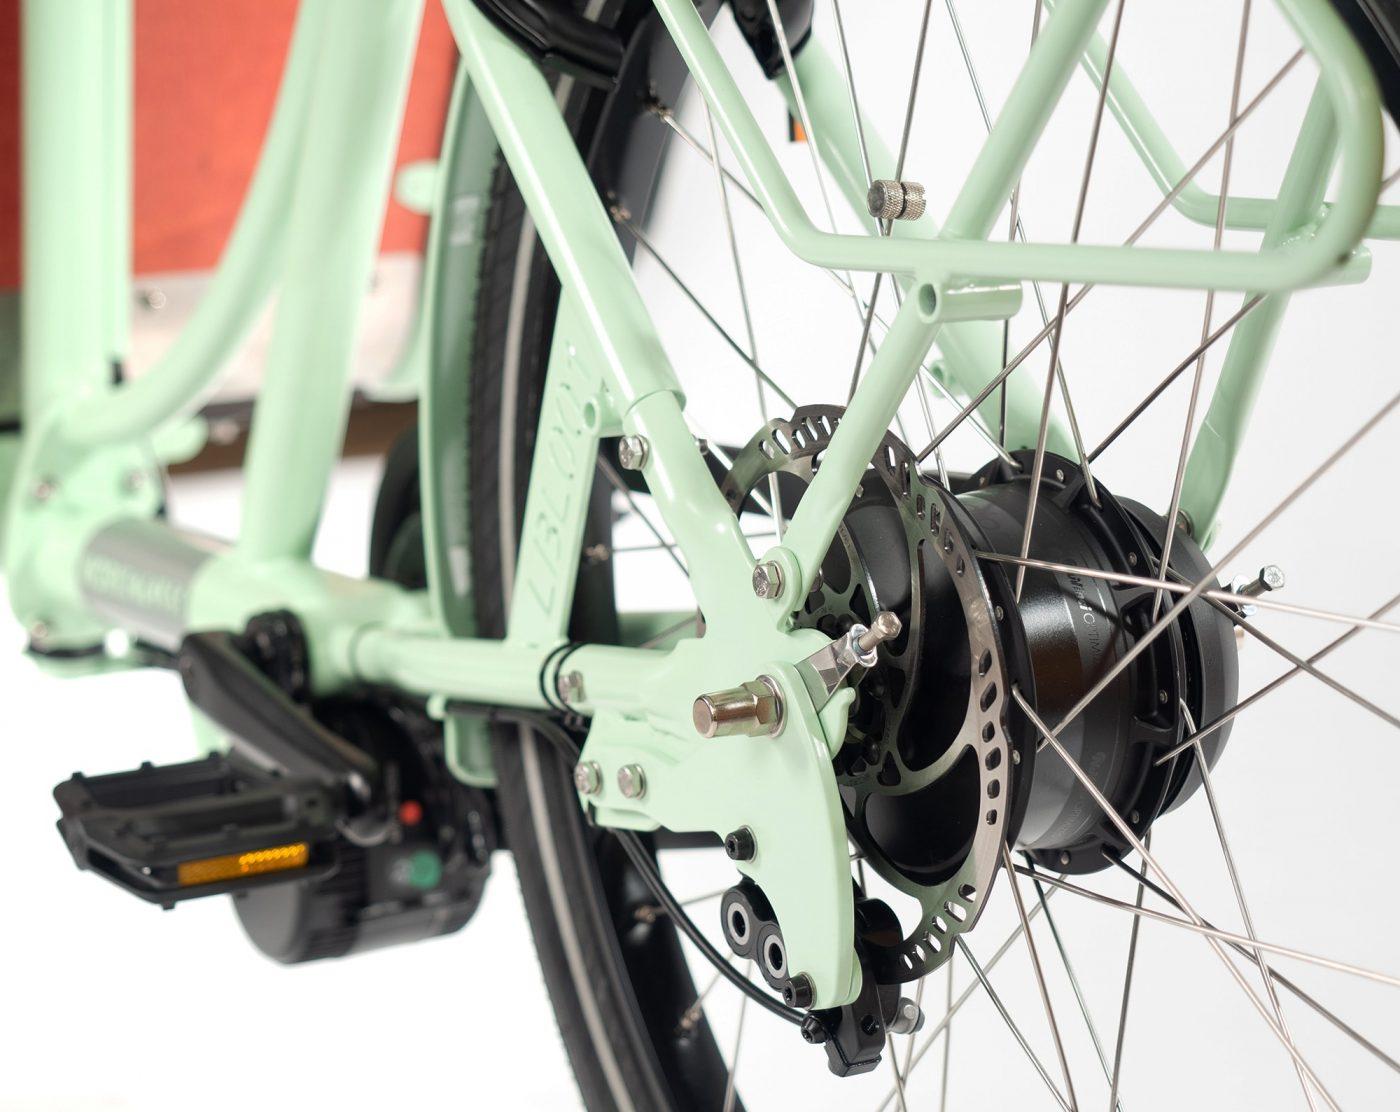 WorkCycles Kr8 MAD bakfiets, child transport bike, dutch e bikes, escape hetch, enviolo hub